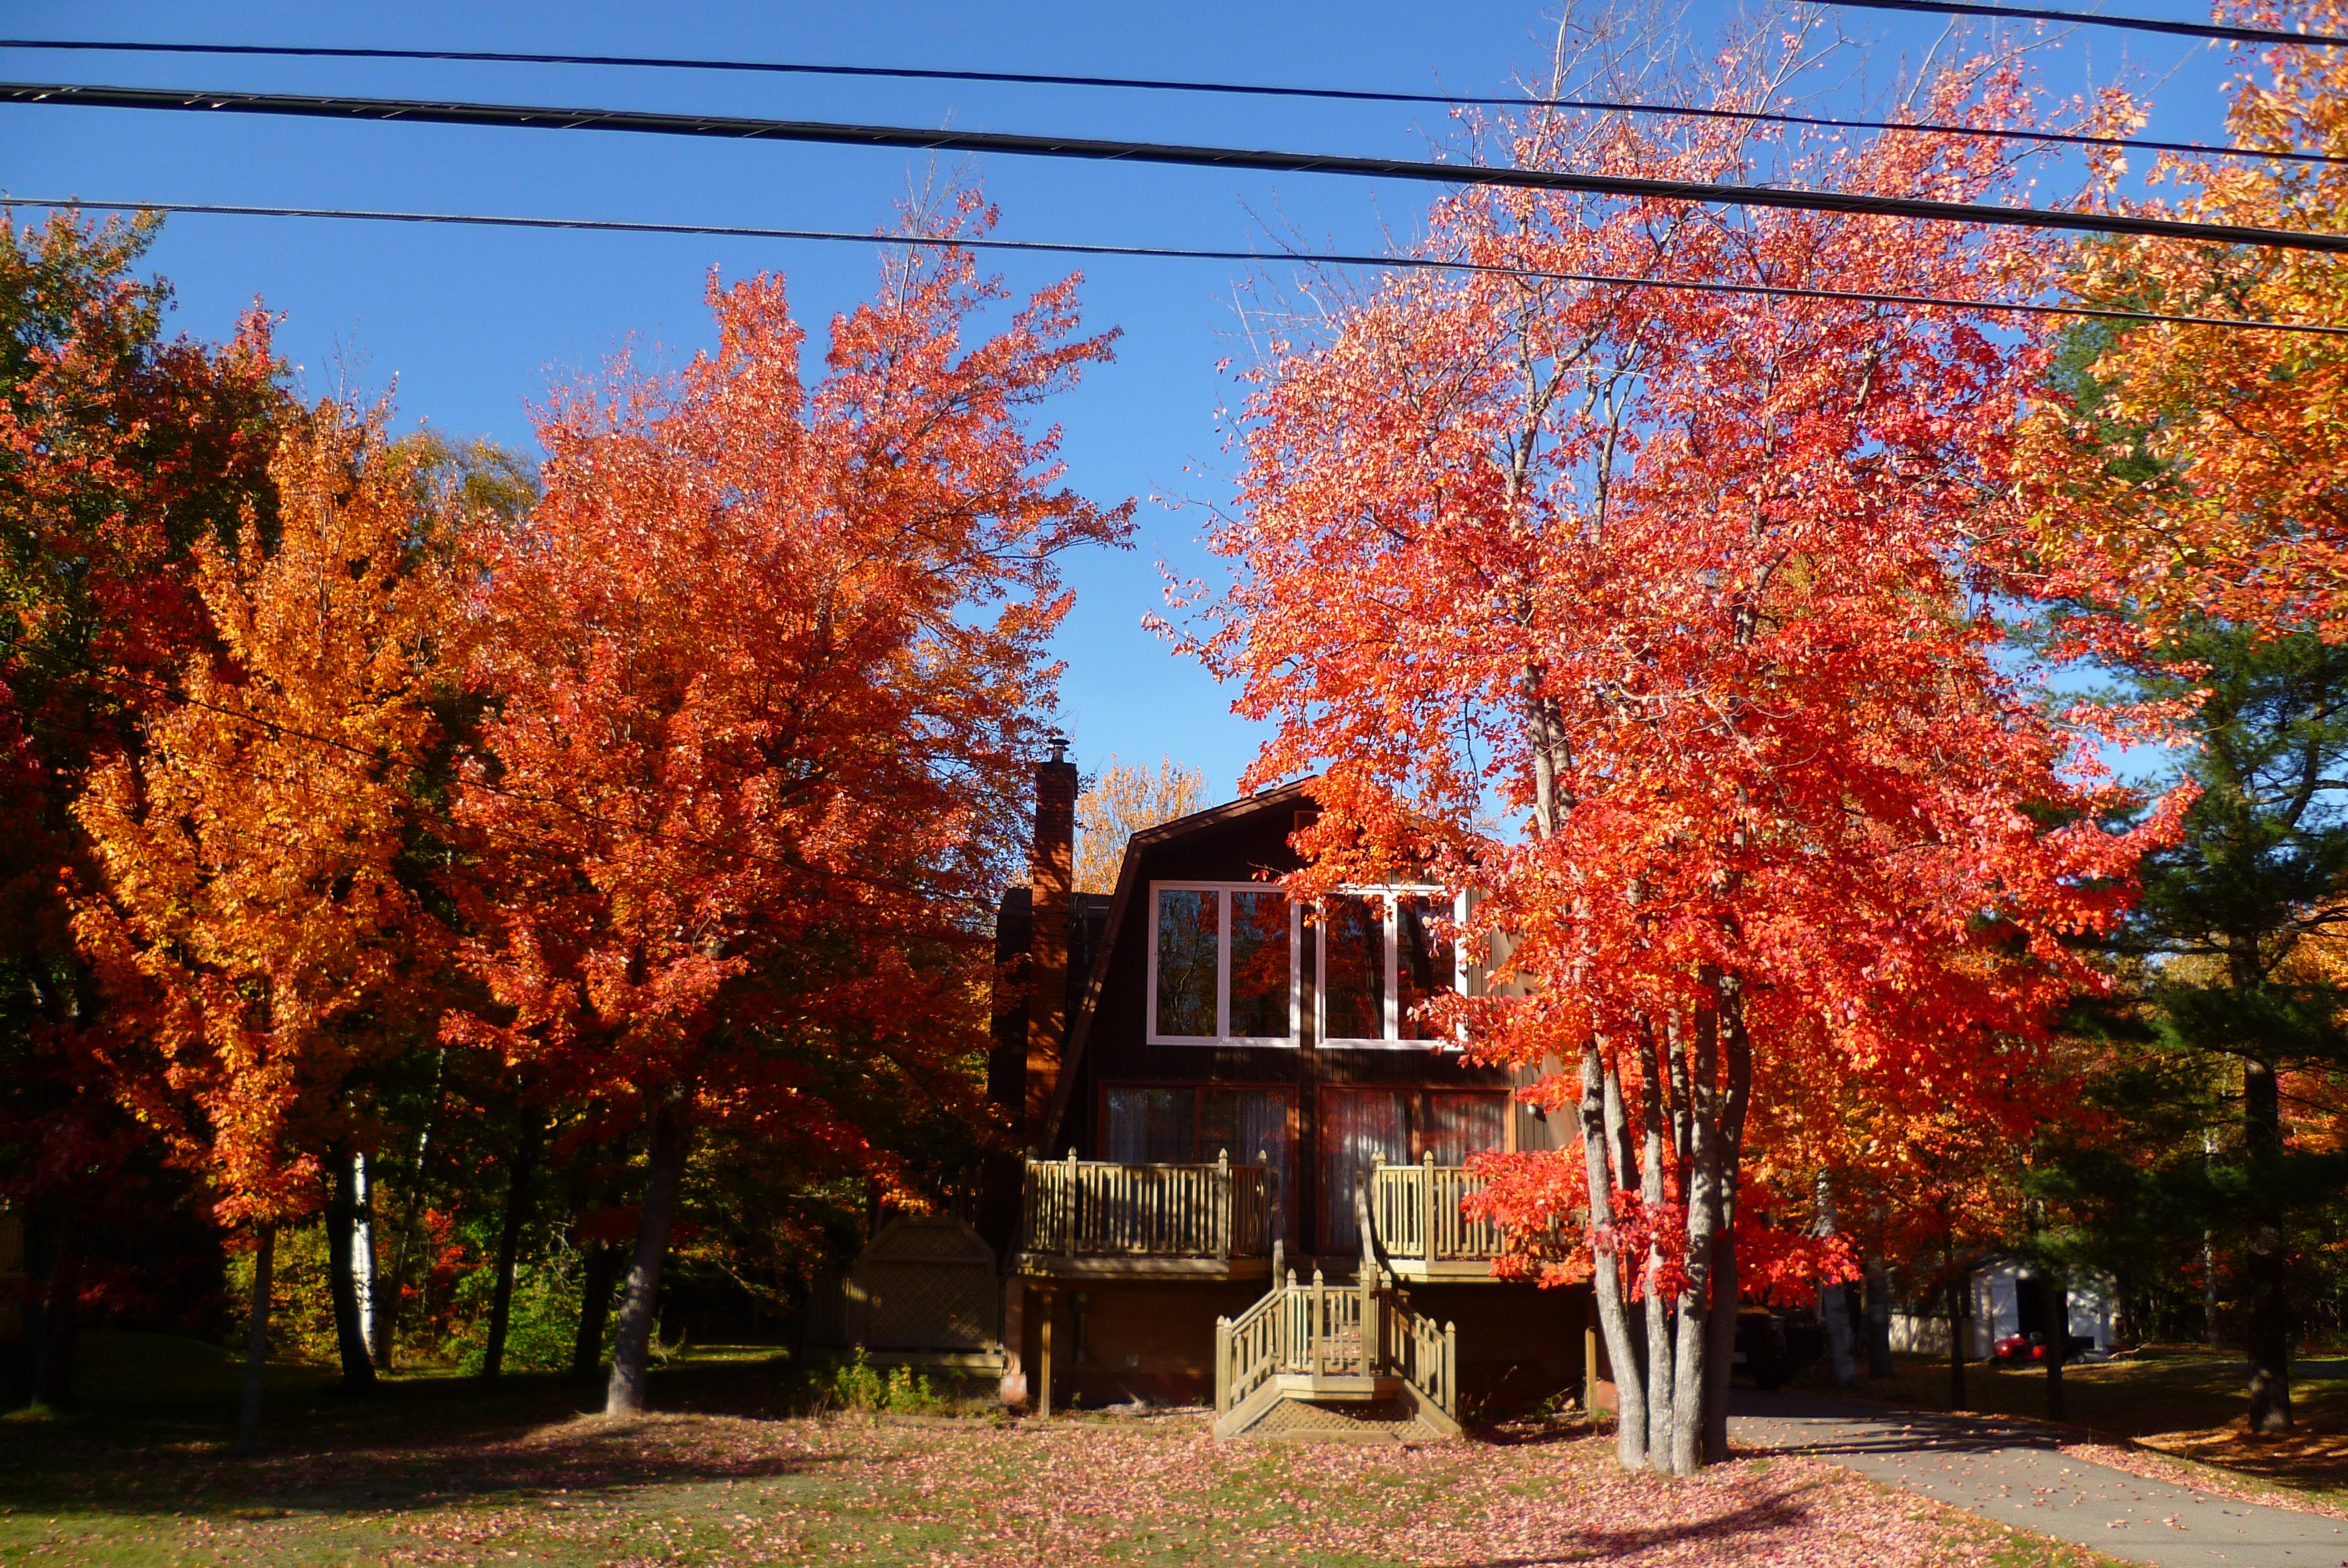 20-maison-en-automne-nb-acadie